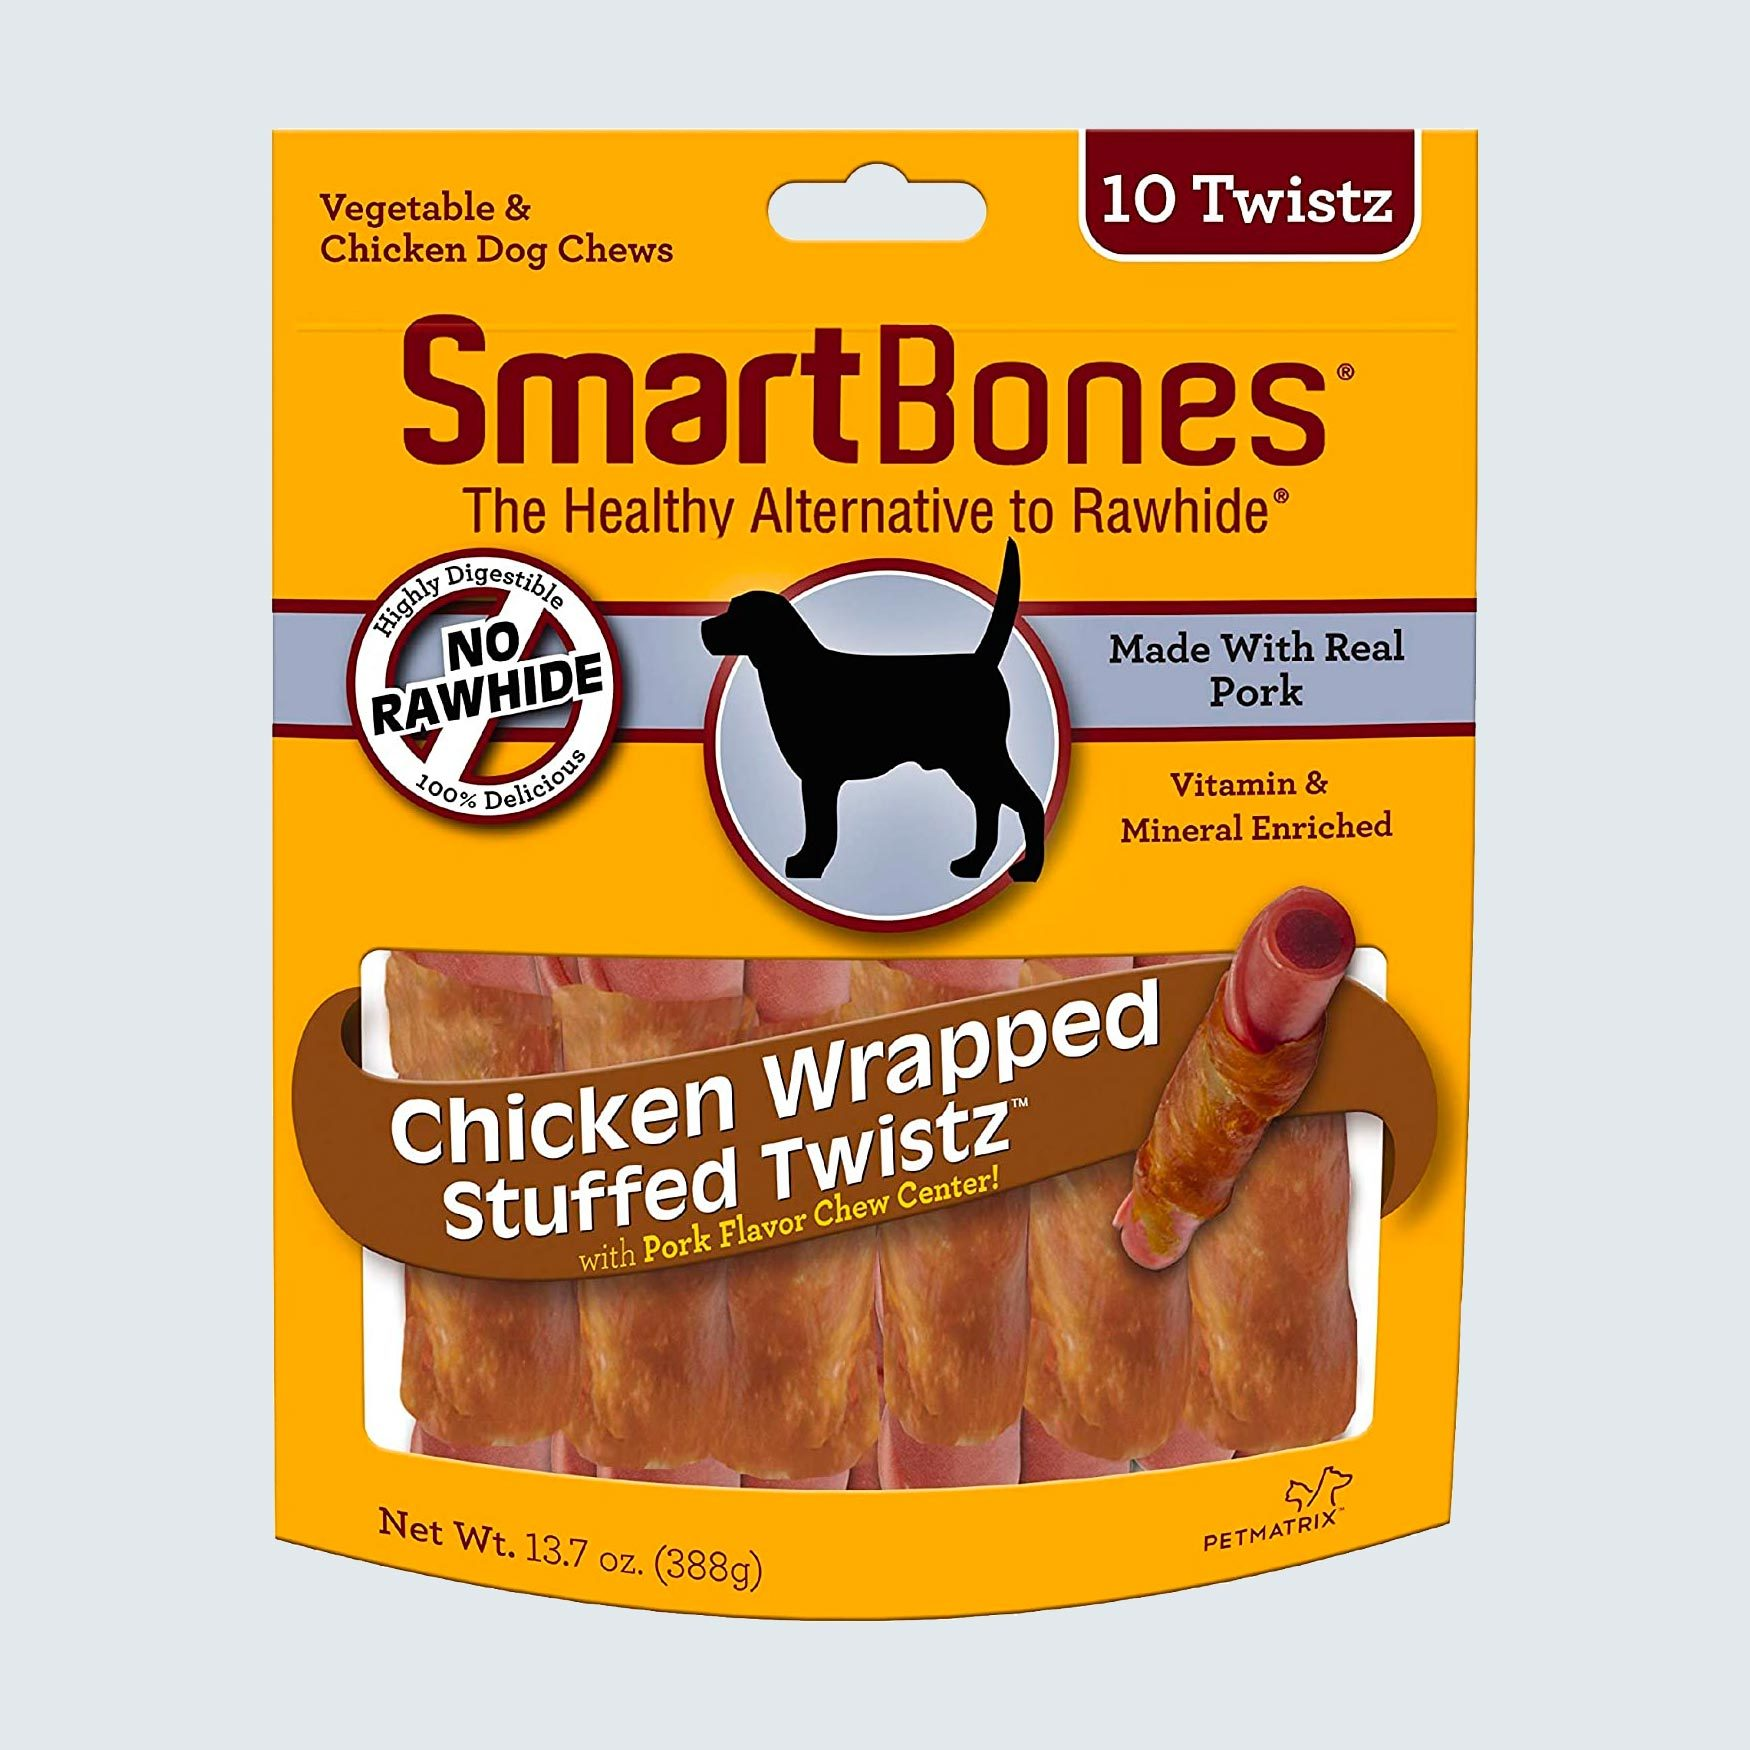 Smartbones Chicken Wrapped Stuffed Twistz